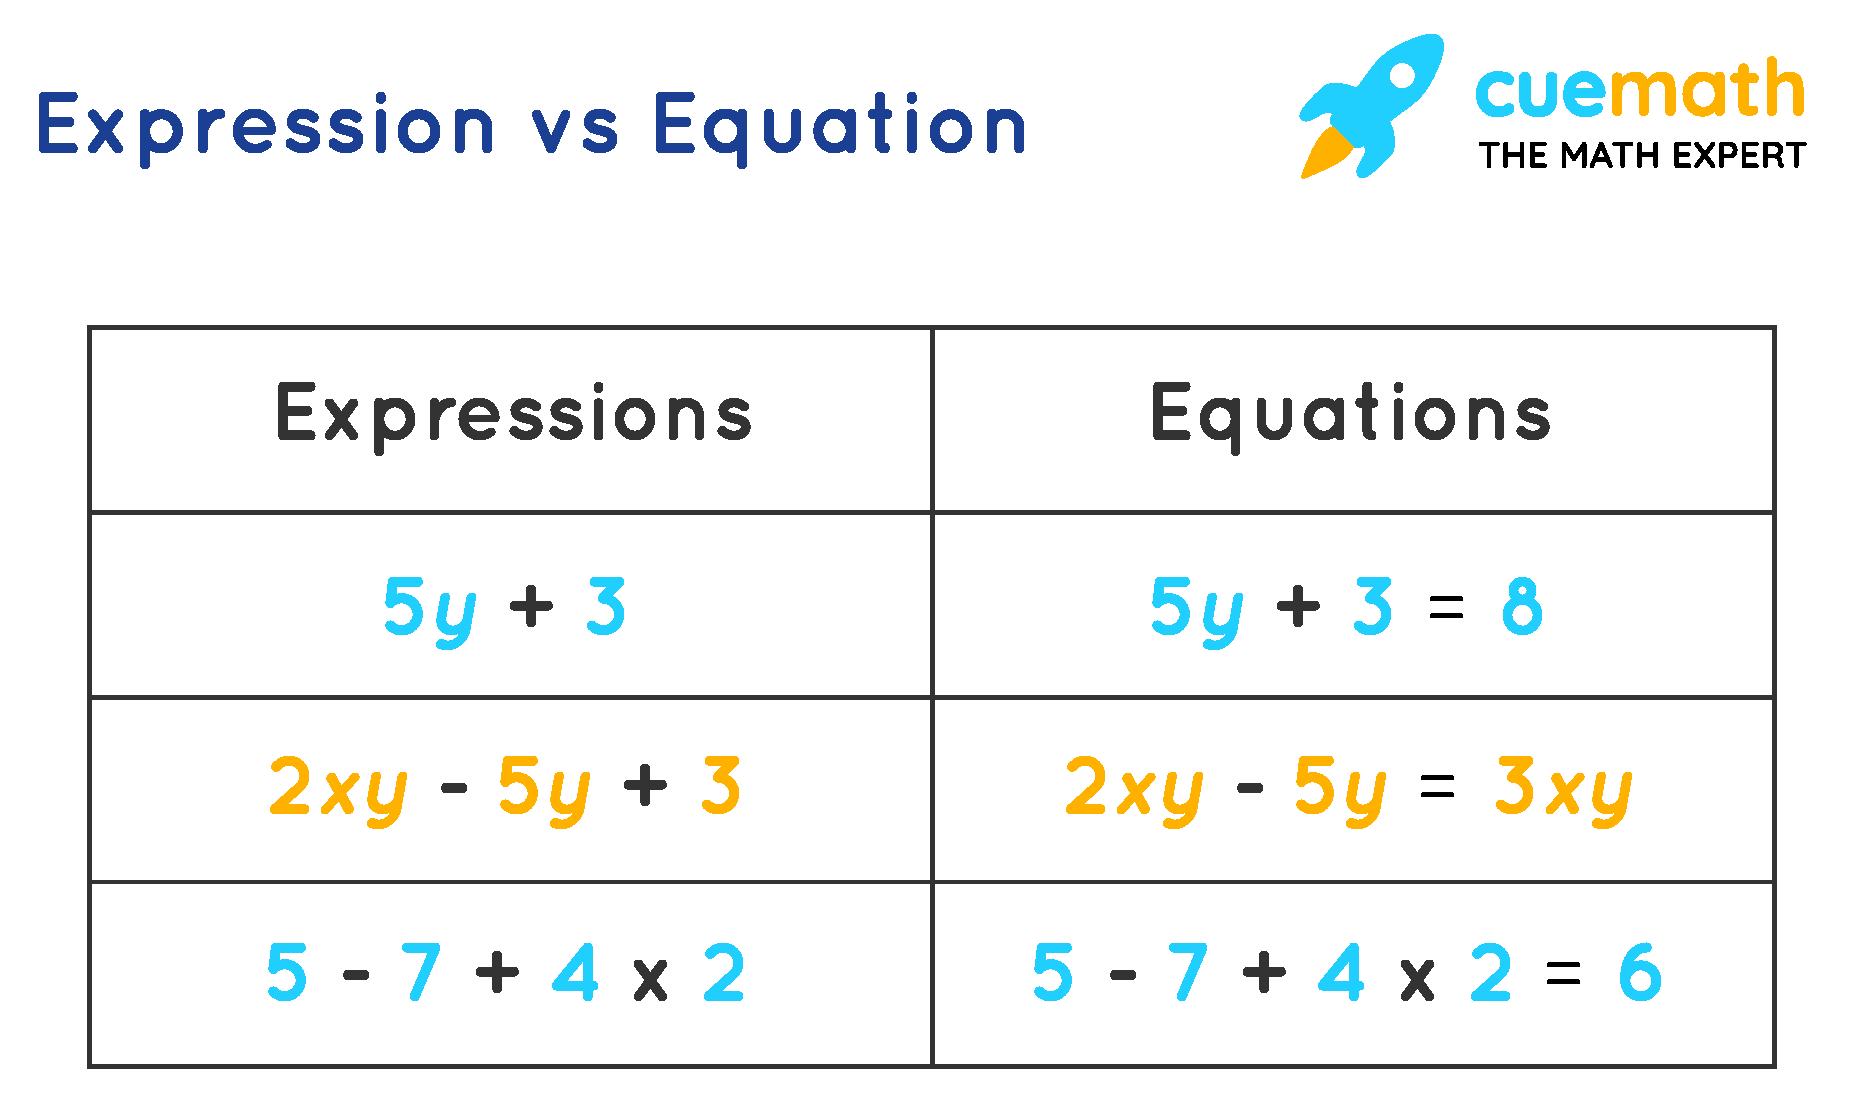 Expression vs. Equation